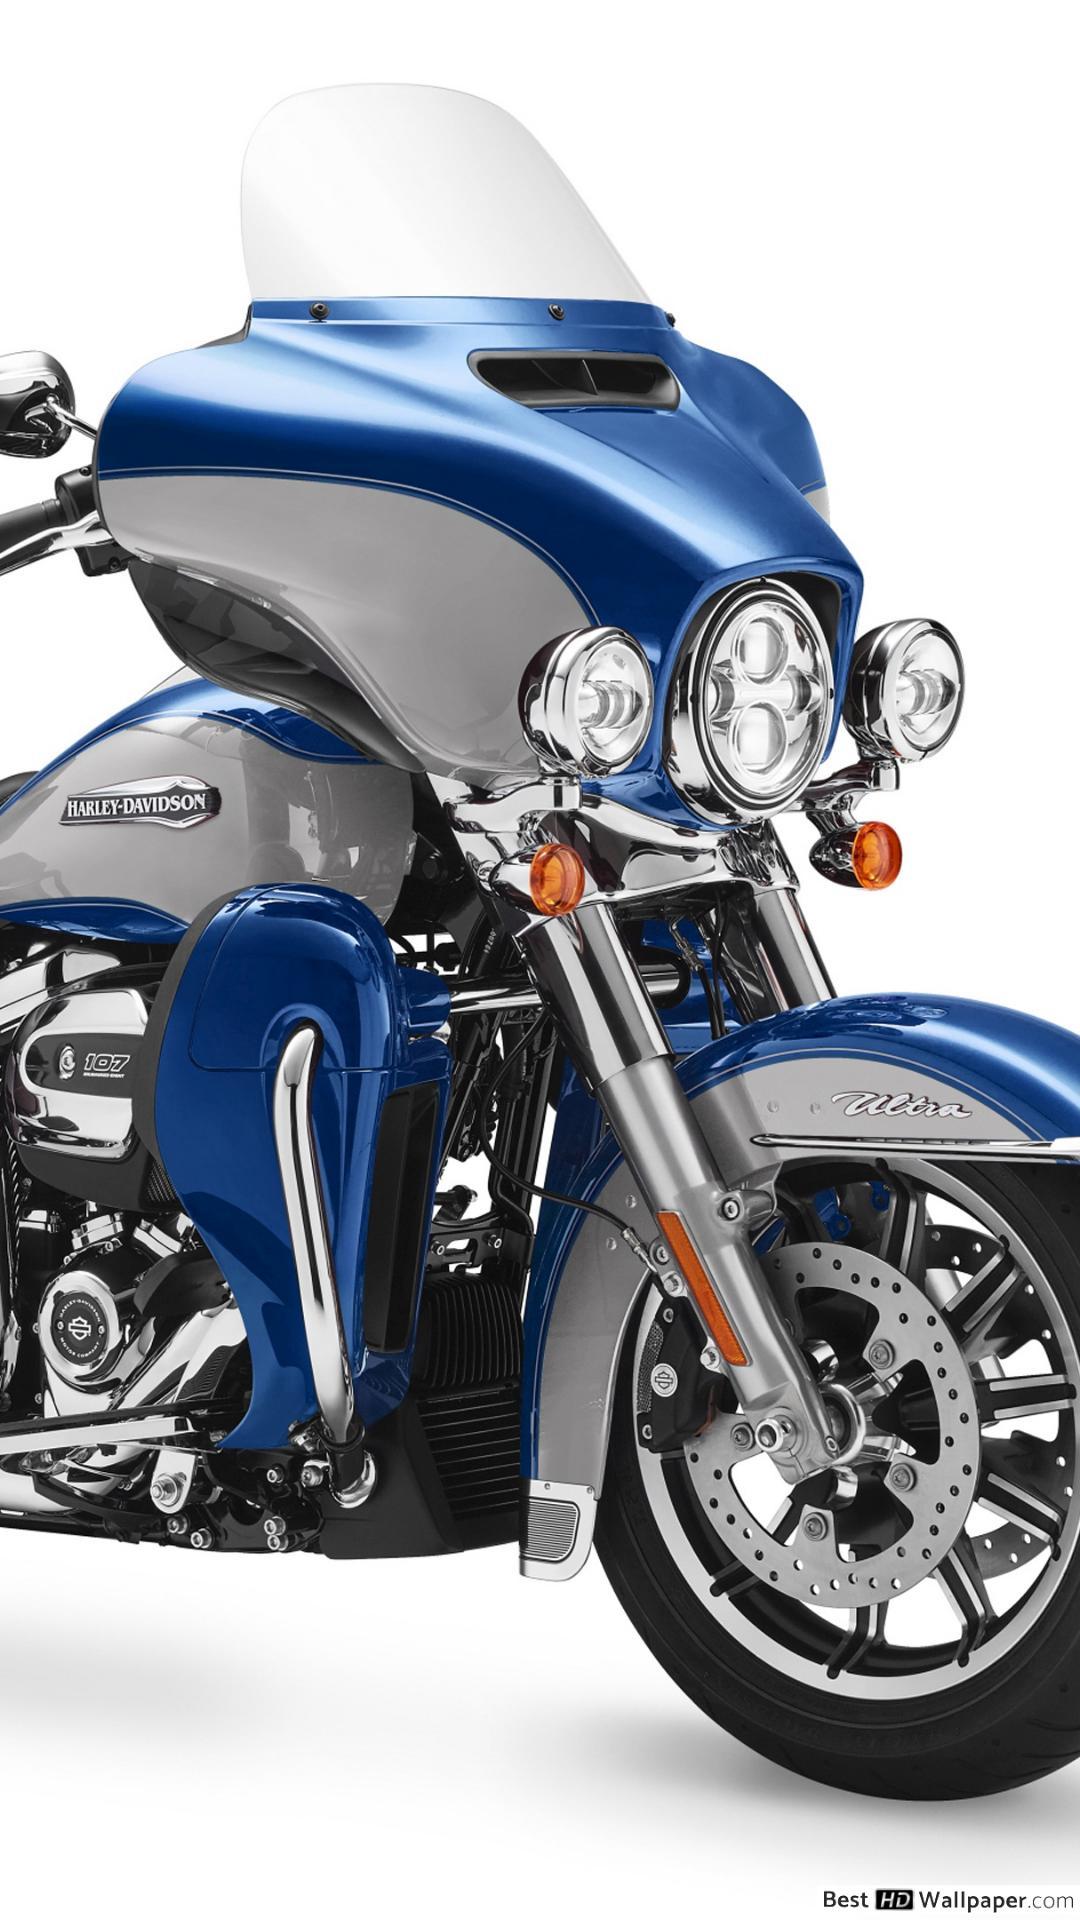 Harley Electra Glide Paint Schemes 1080x1920 Wallpaper Teahub Io